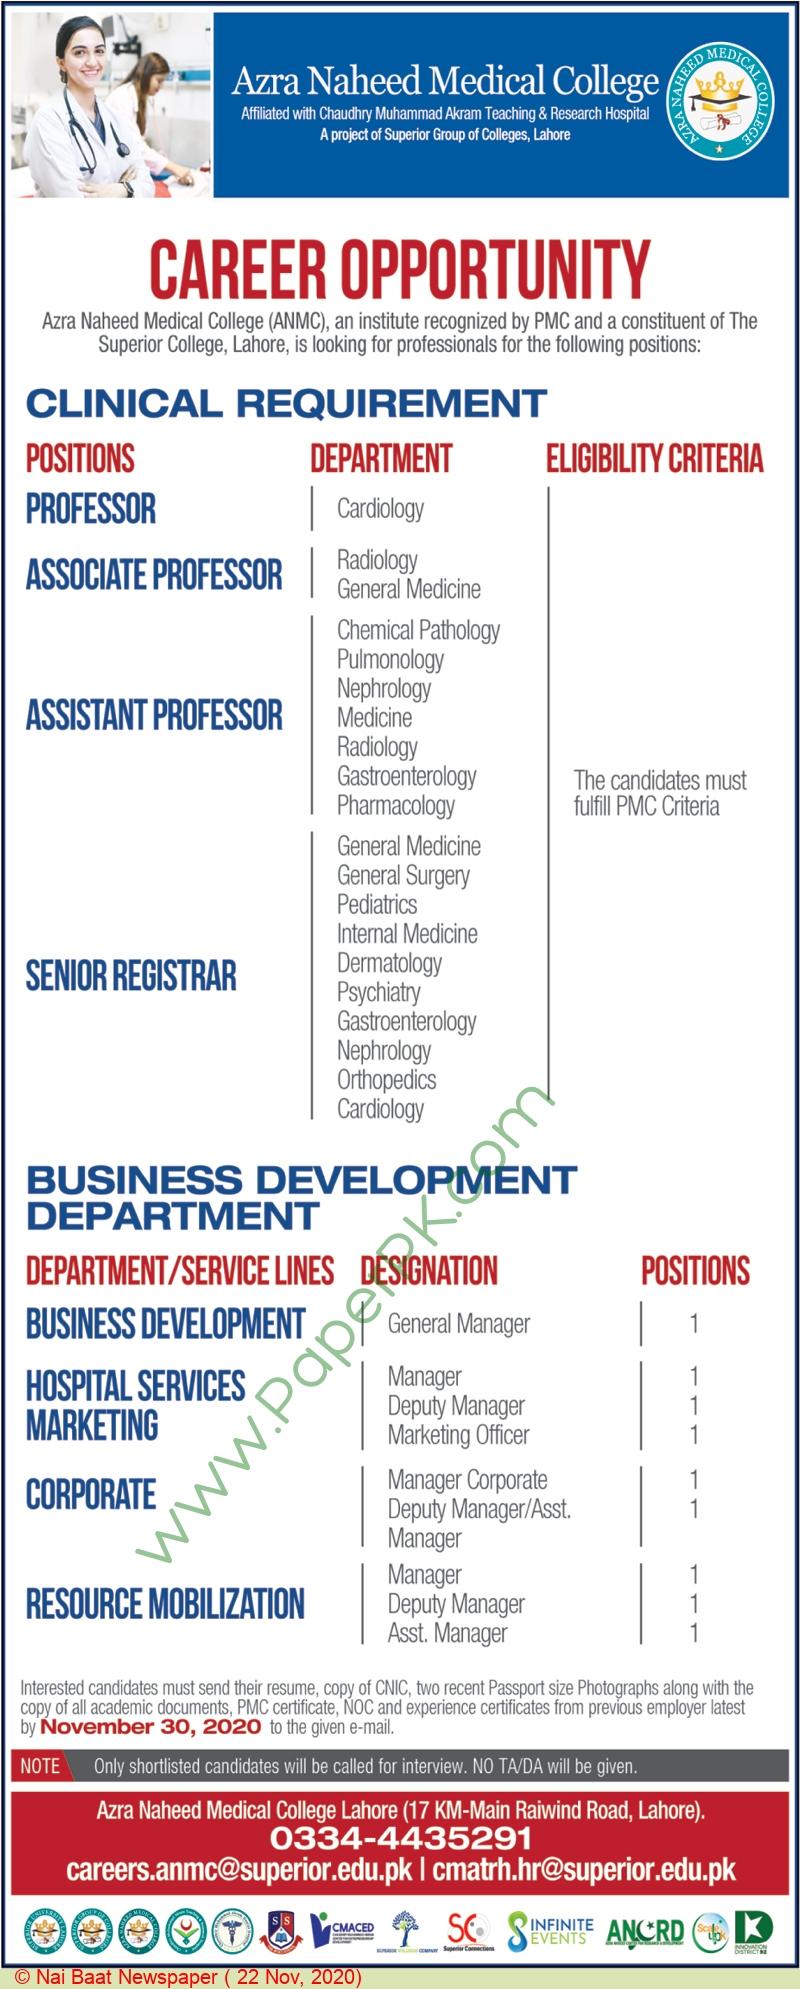 Azra Naheed Medical College jobs newspaper ad for Senior Registrar in Lahore